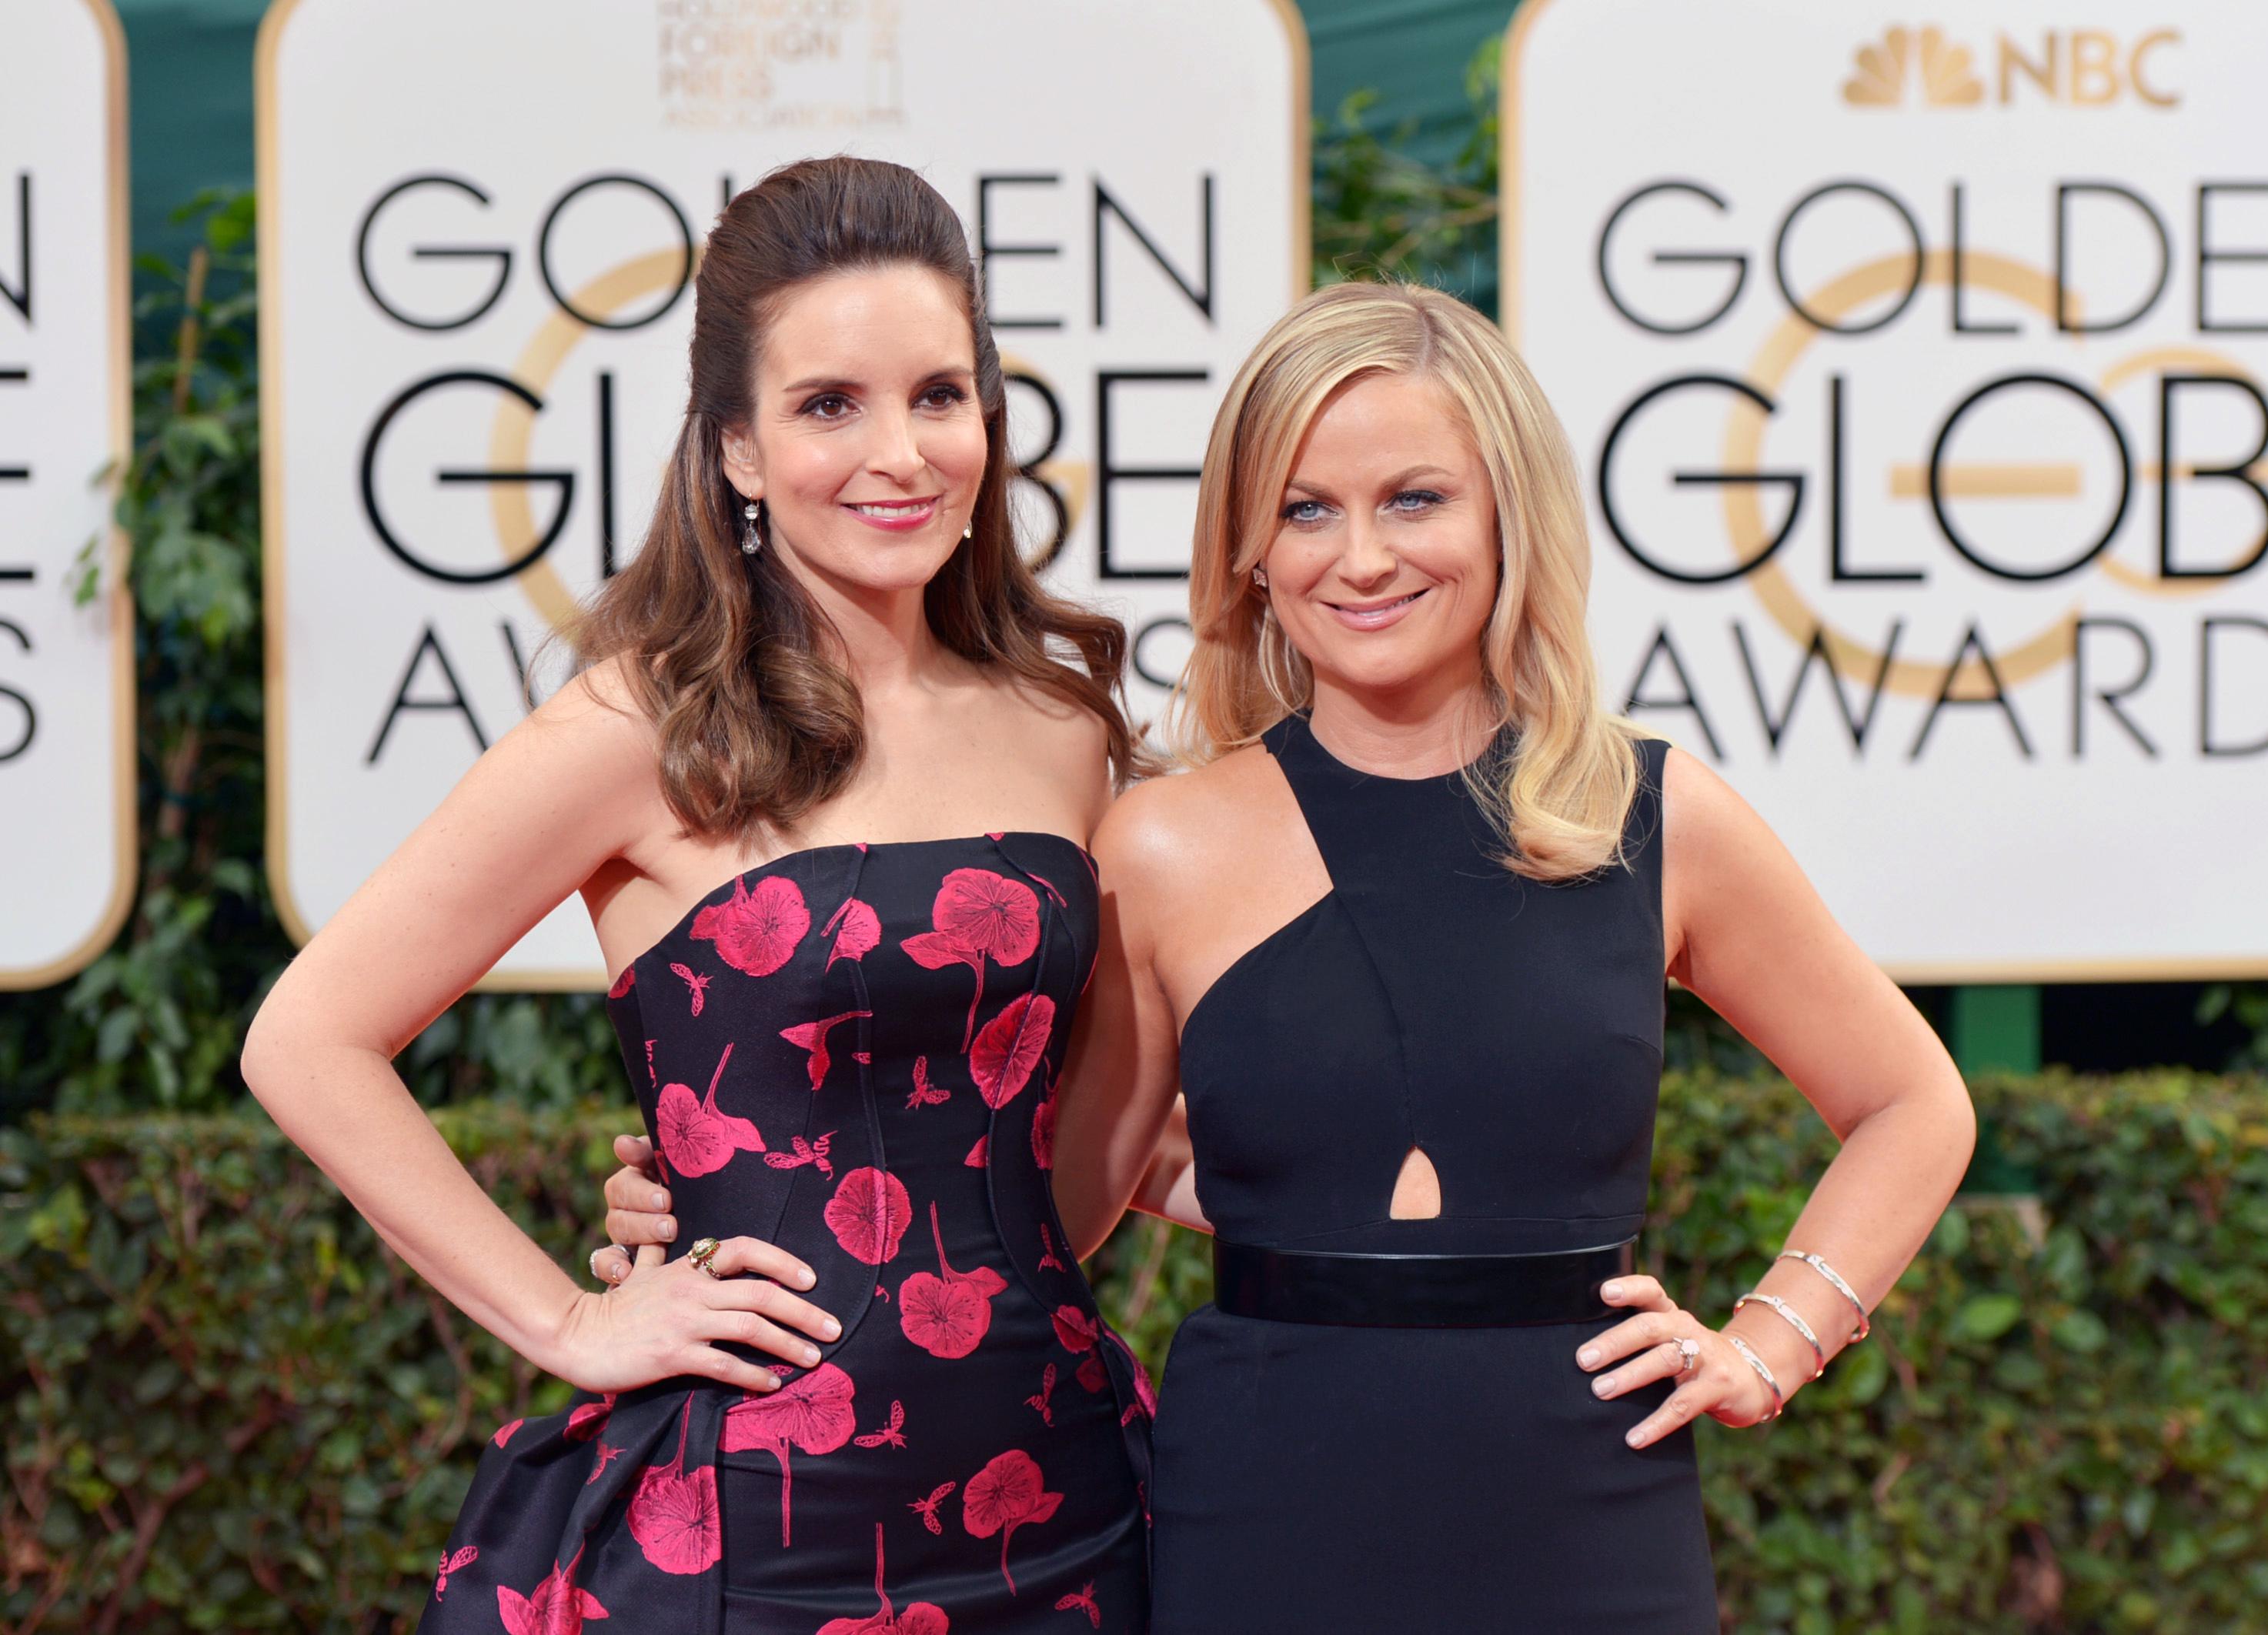 Tina Fey Amy Poehler Golden Globes Red Carpet - H 2014